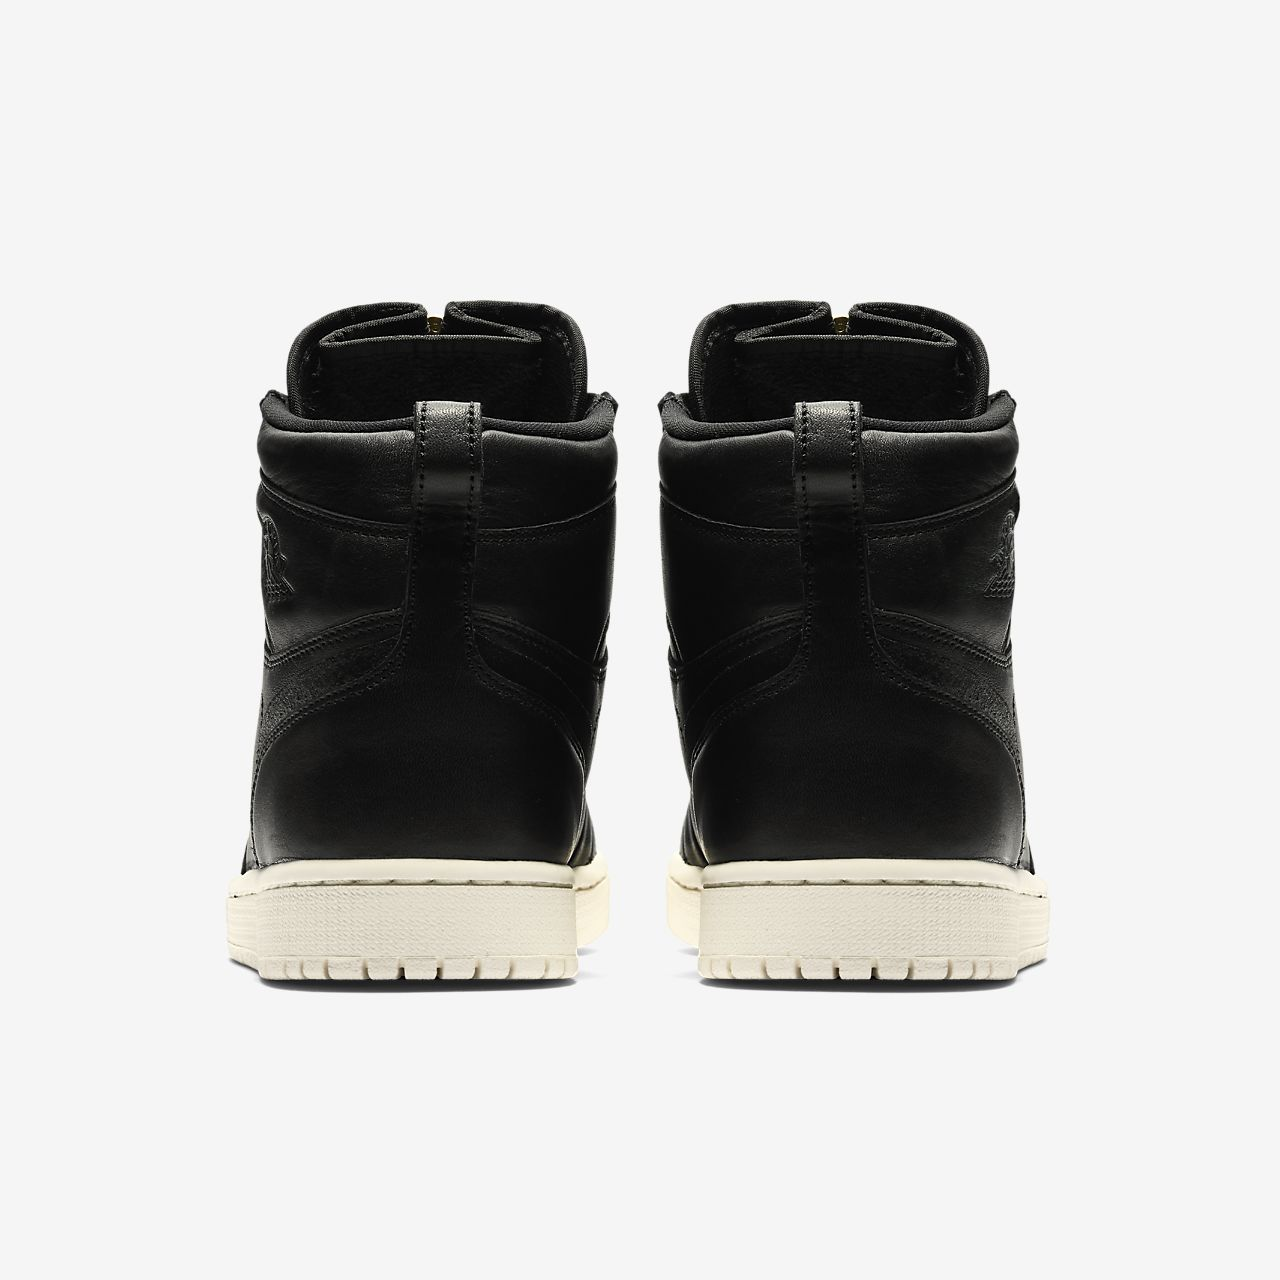 983b35277bbee Air Jordan 1 High Zip Women s Shoe. Nike.com